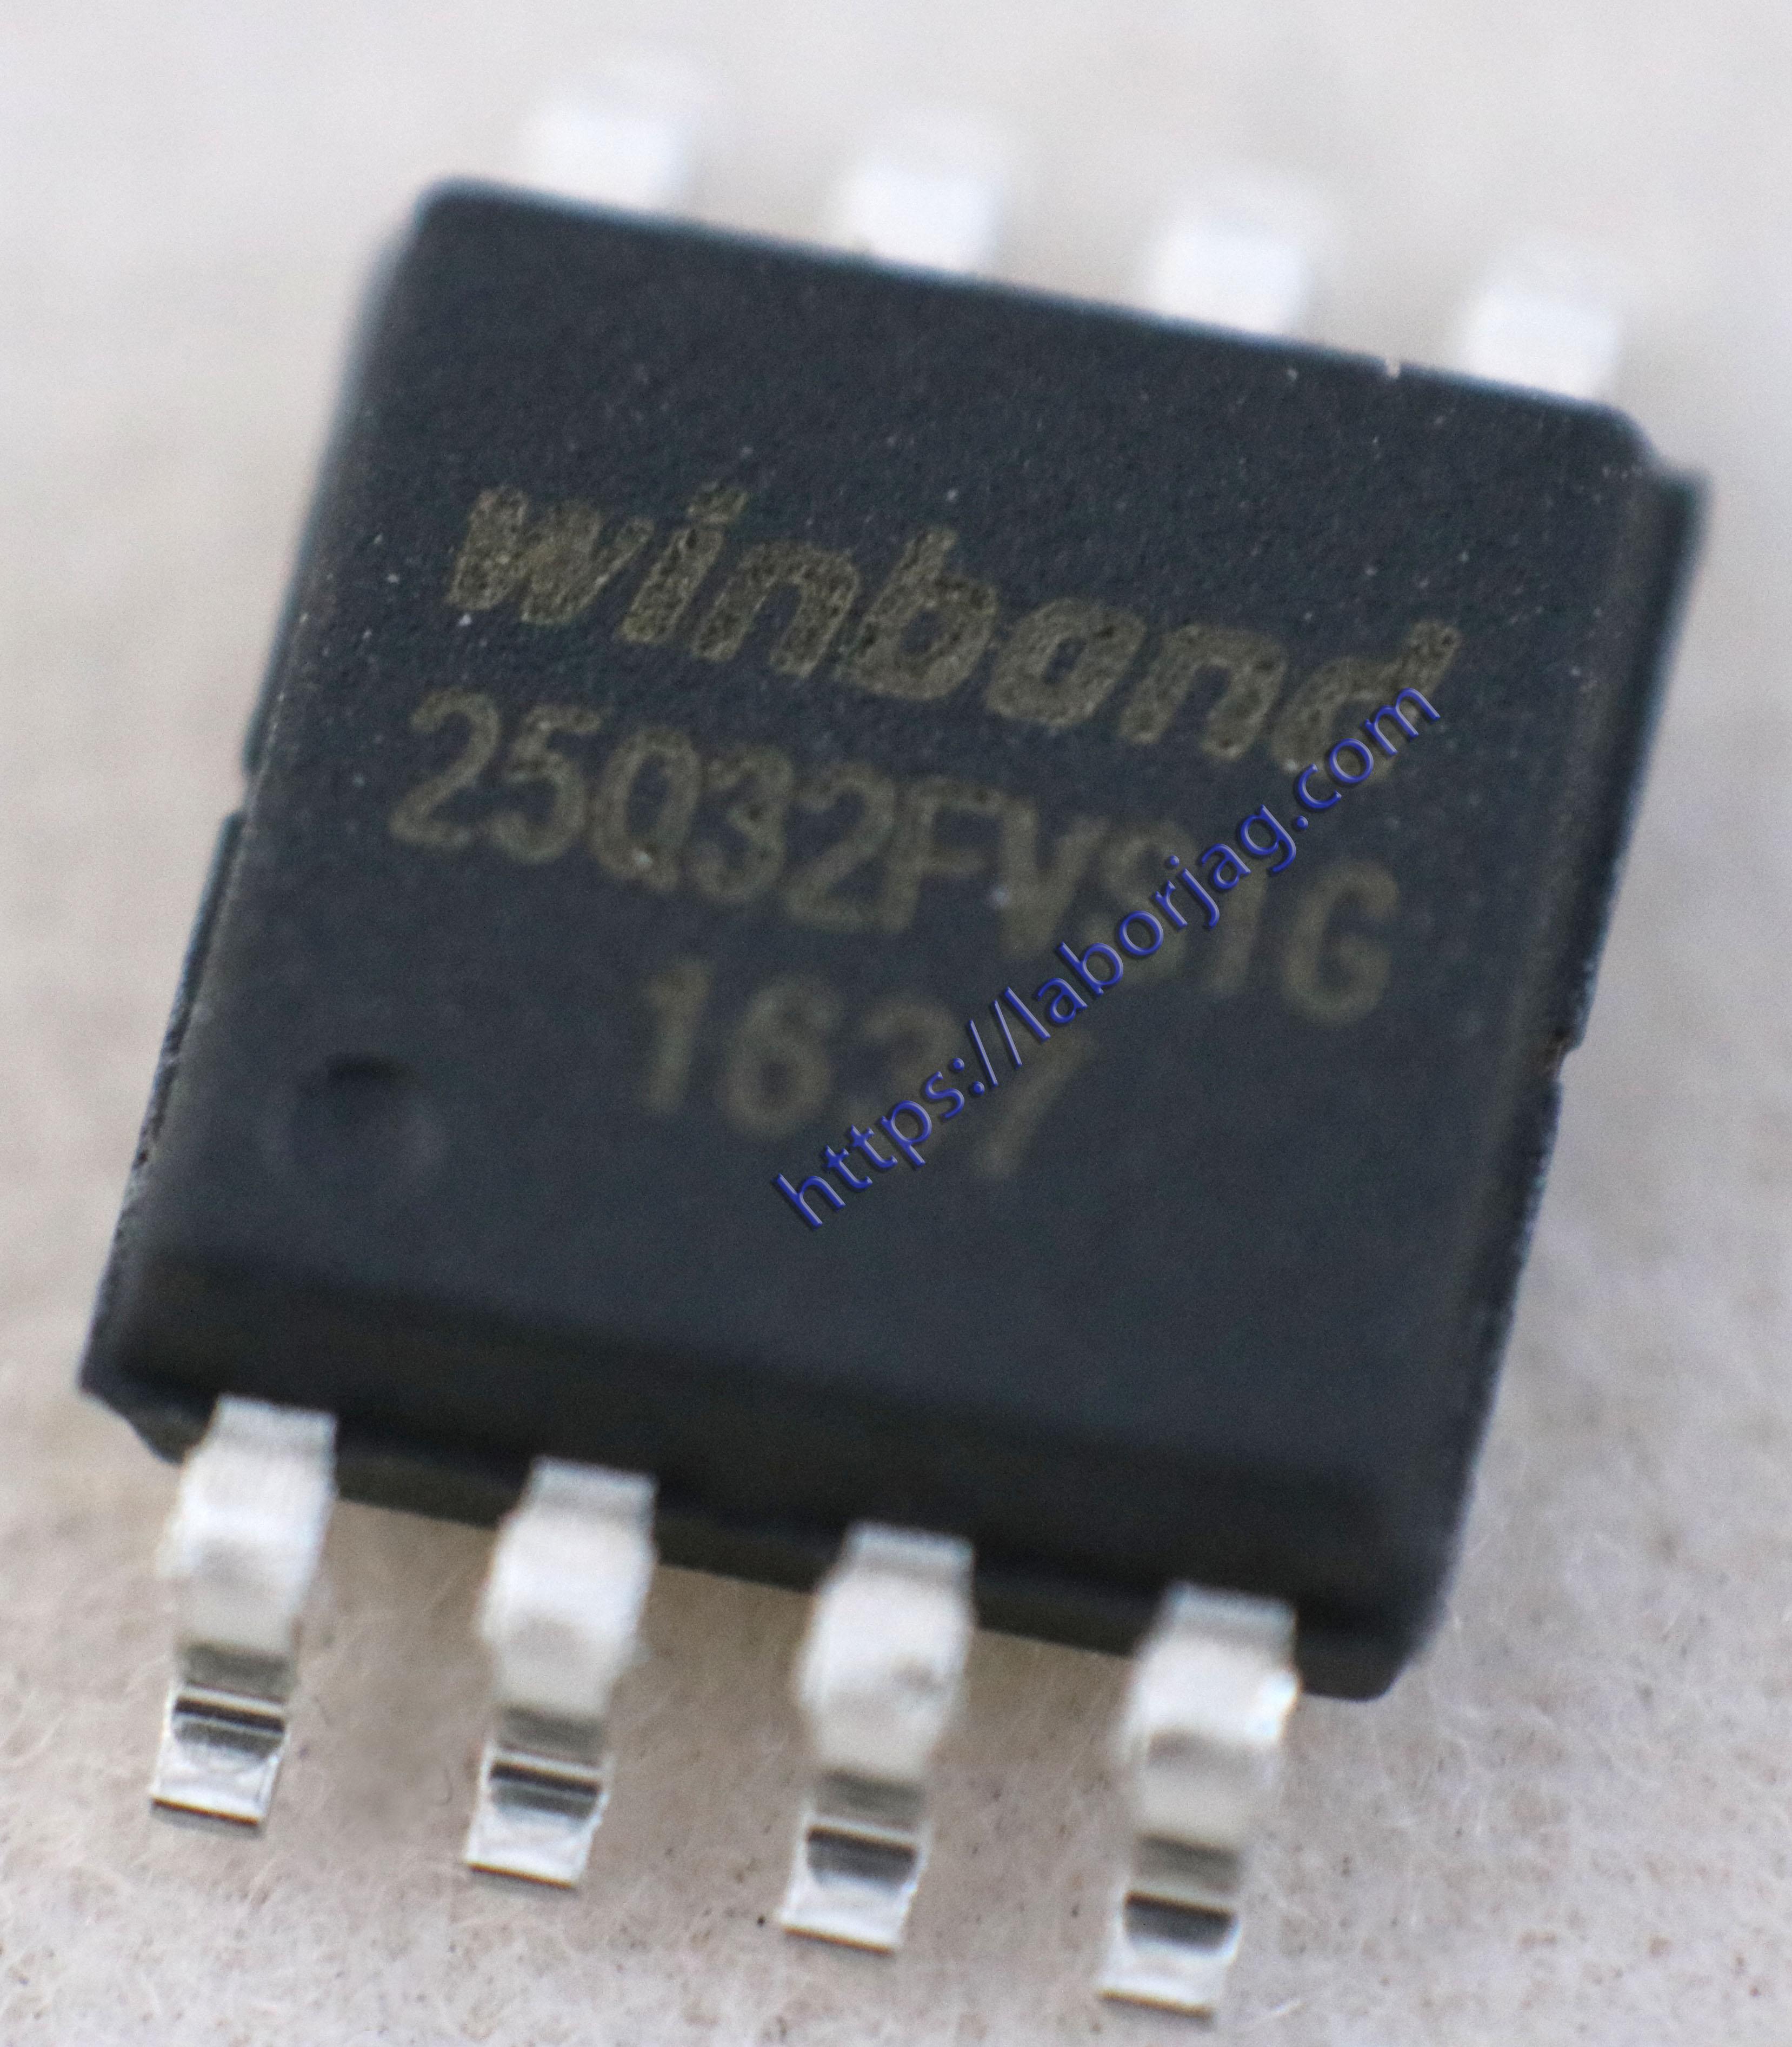 Flash Memory W25q32fvsig Borja Home Page Copper Clad Boards 10x15cm 100x150x12mm High Quality For Circuit Pcb